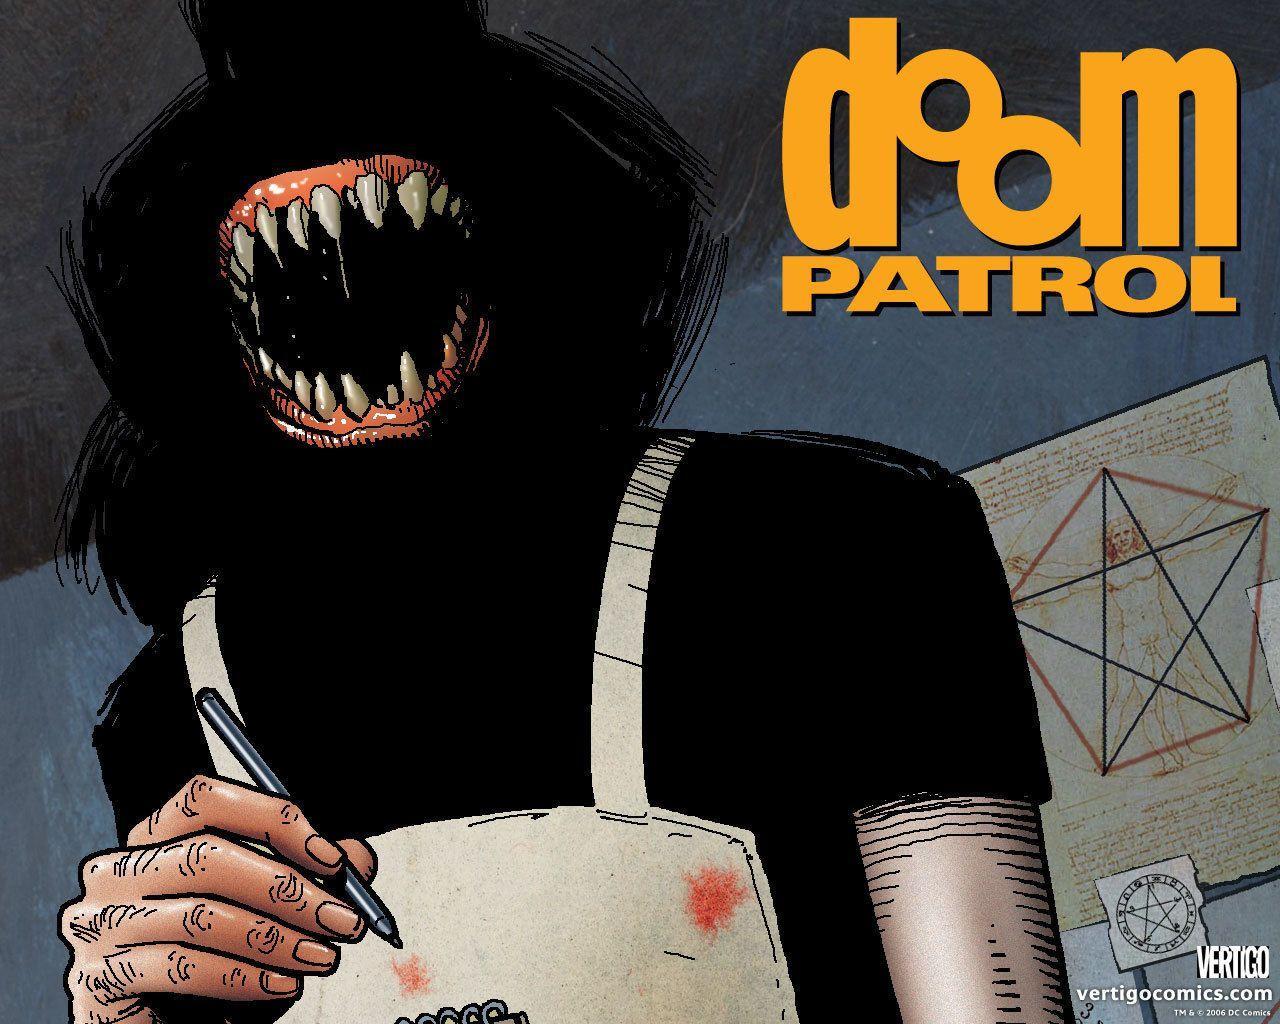 Doom Patrol Wallpapers Top Free Doom Patrol Backgrounds Wallpaperaccess